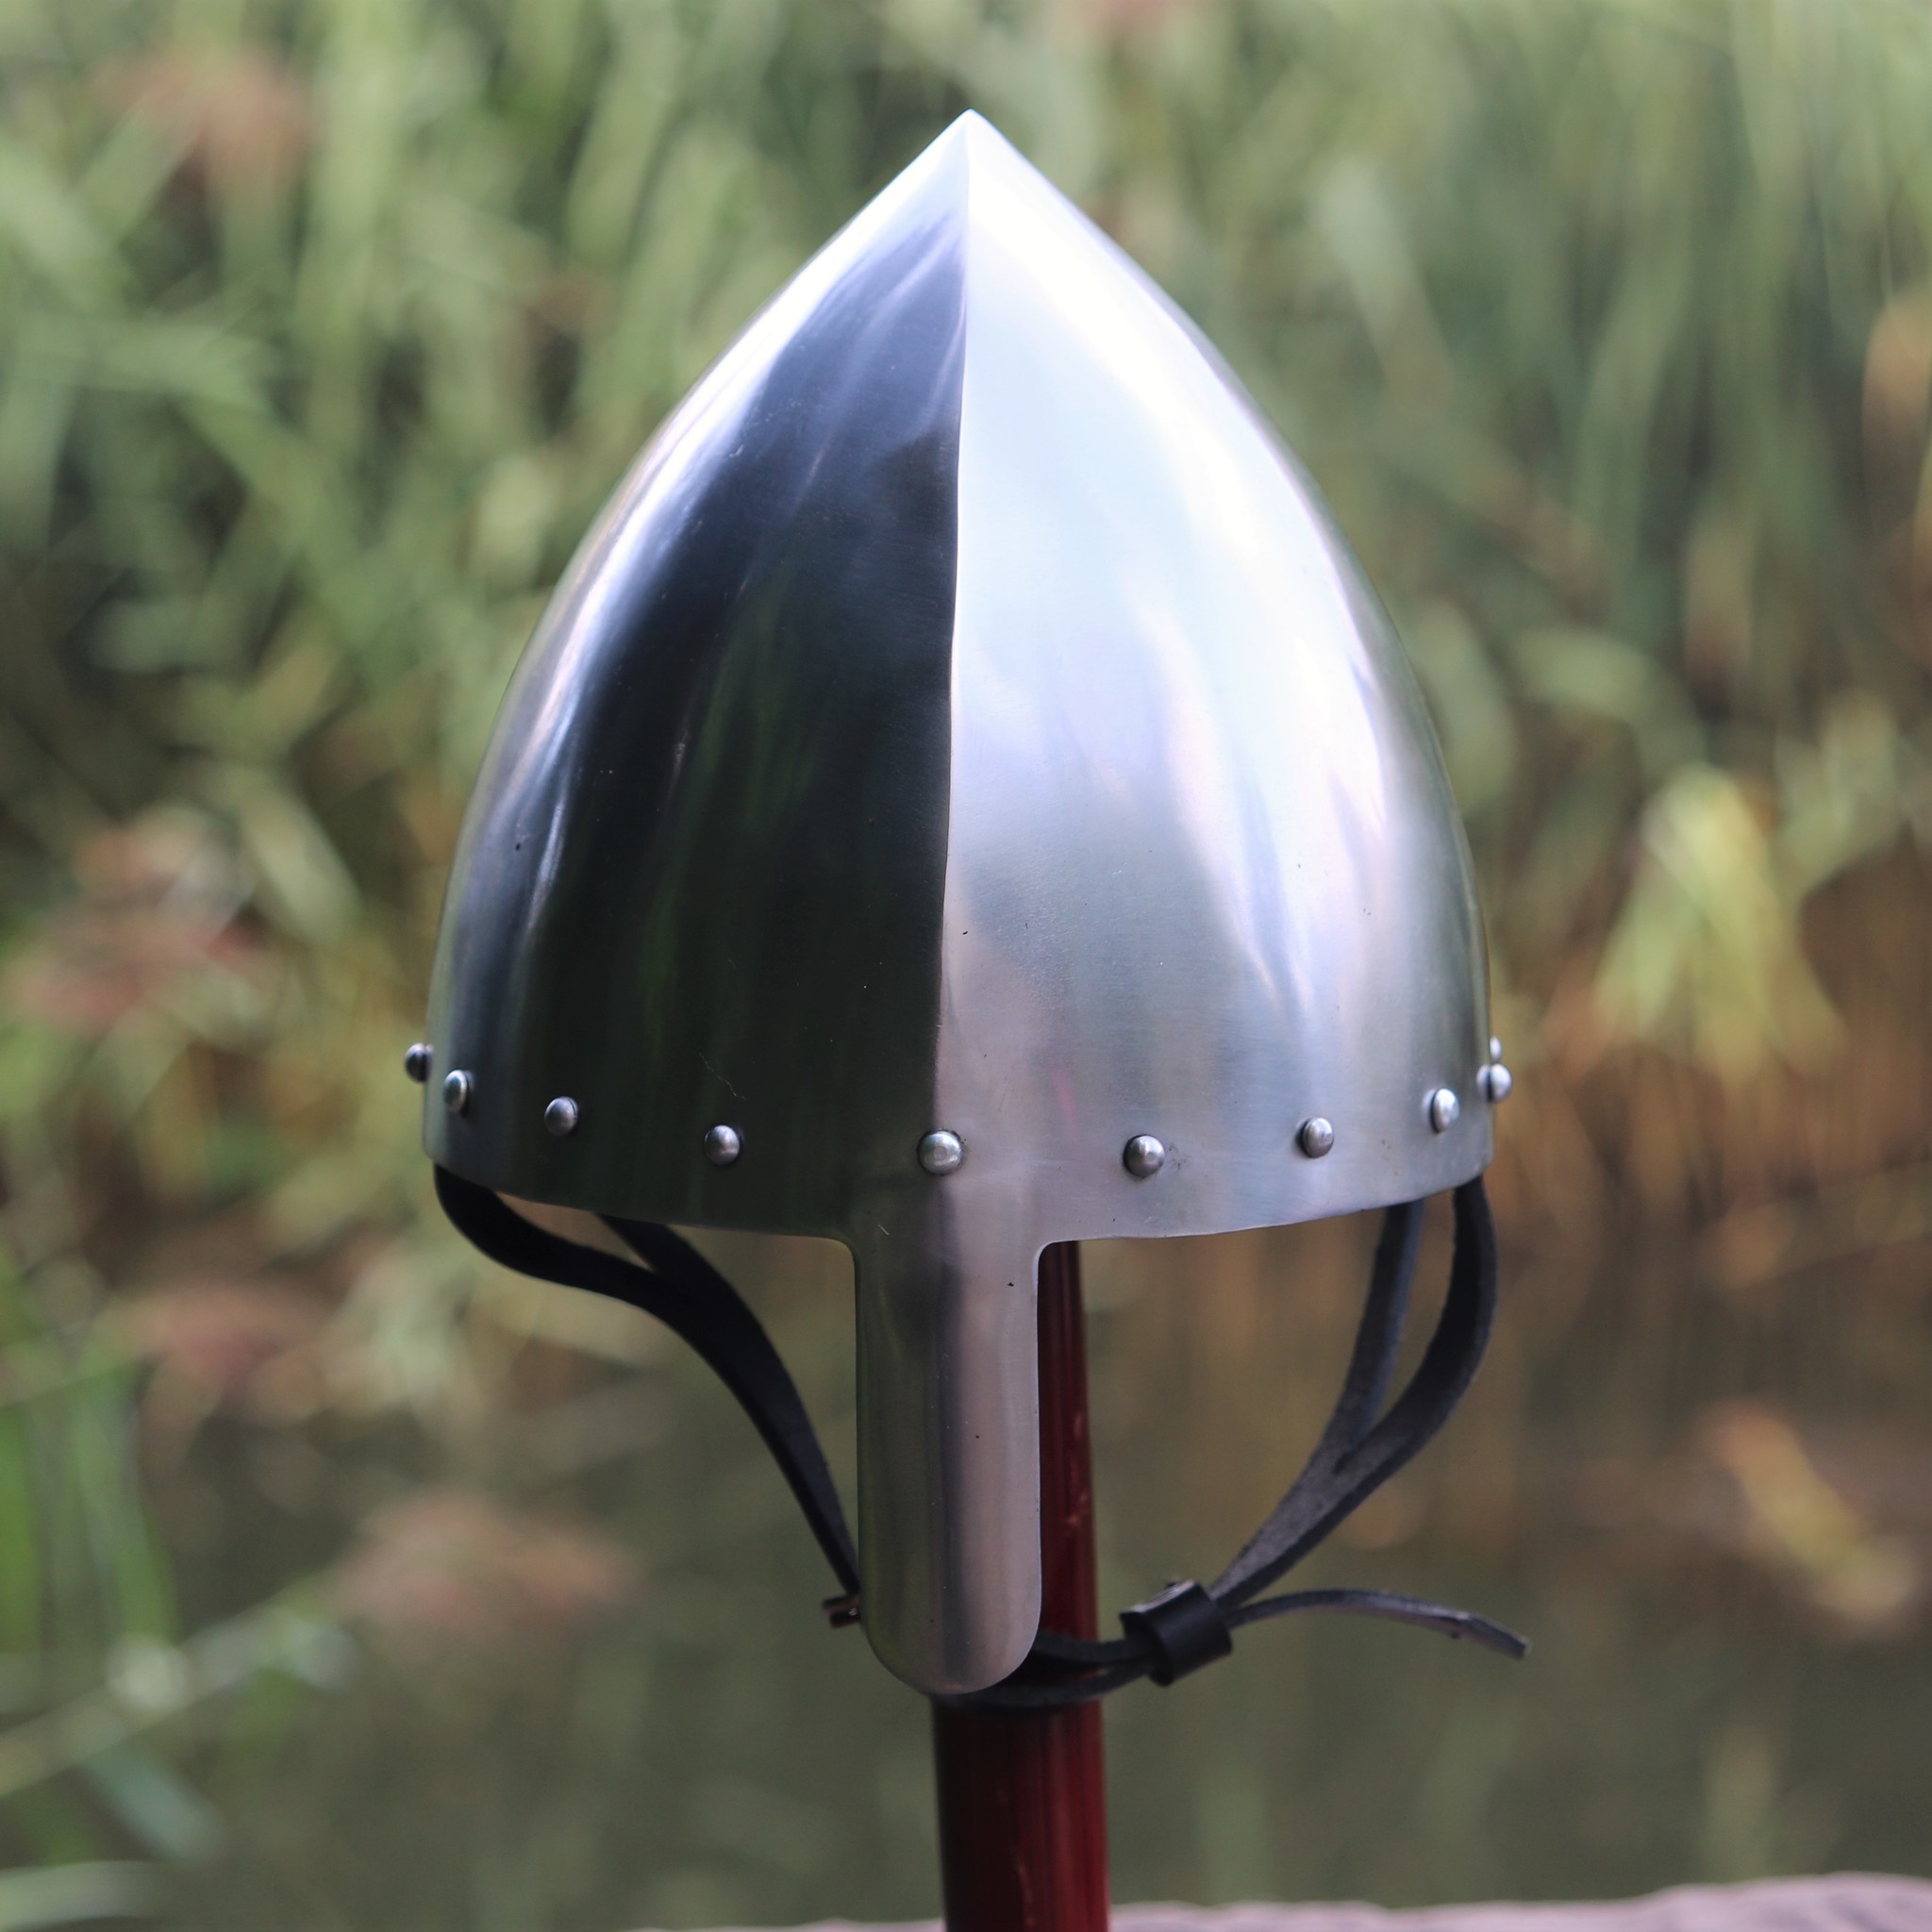 11de eeuwse neushelm